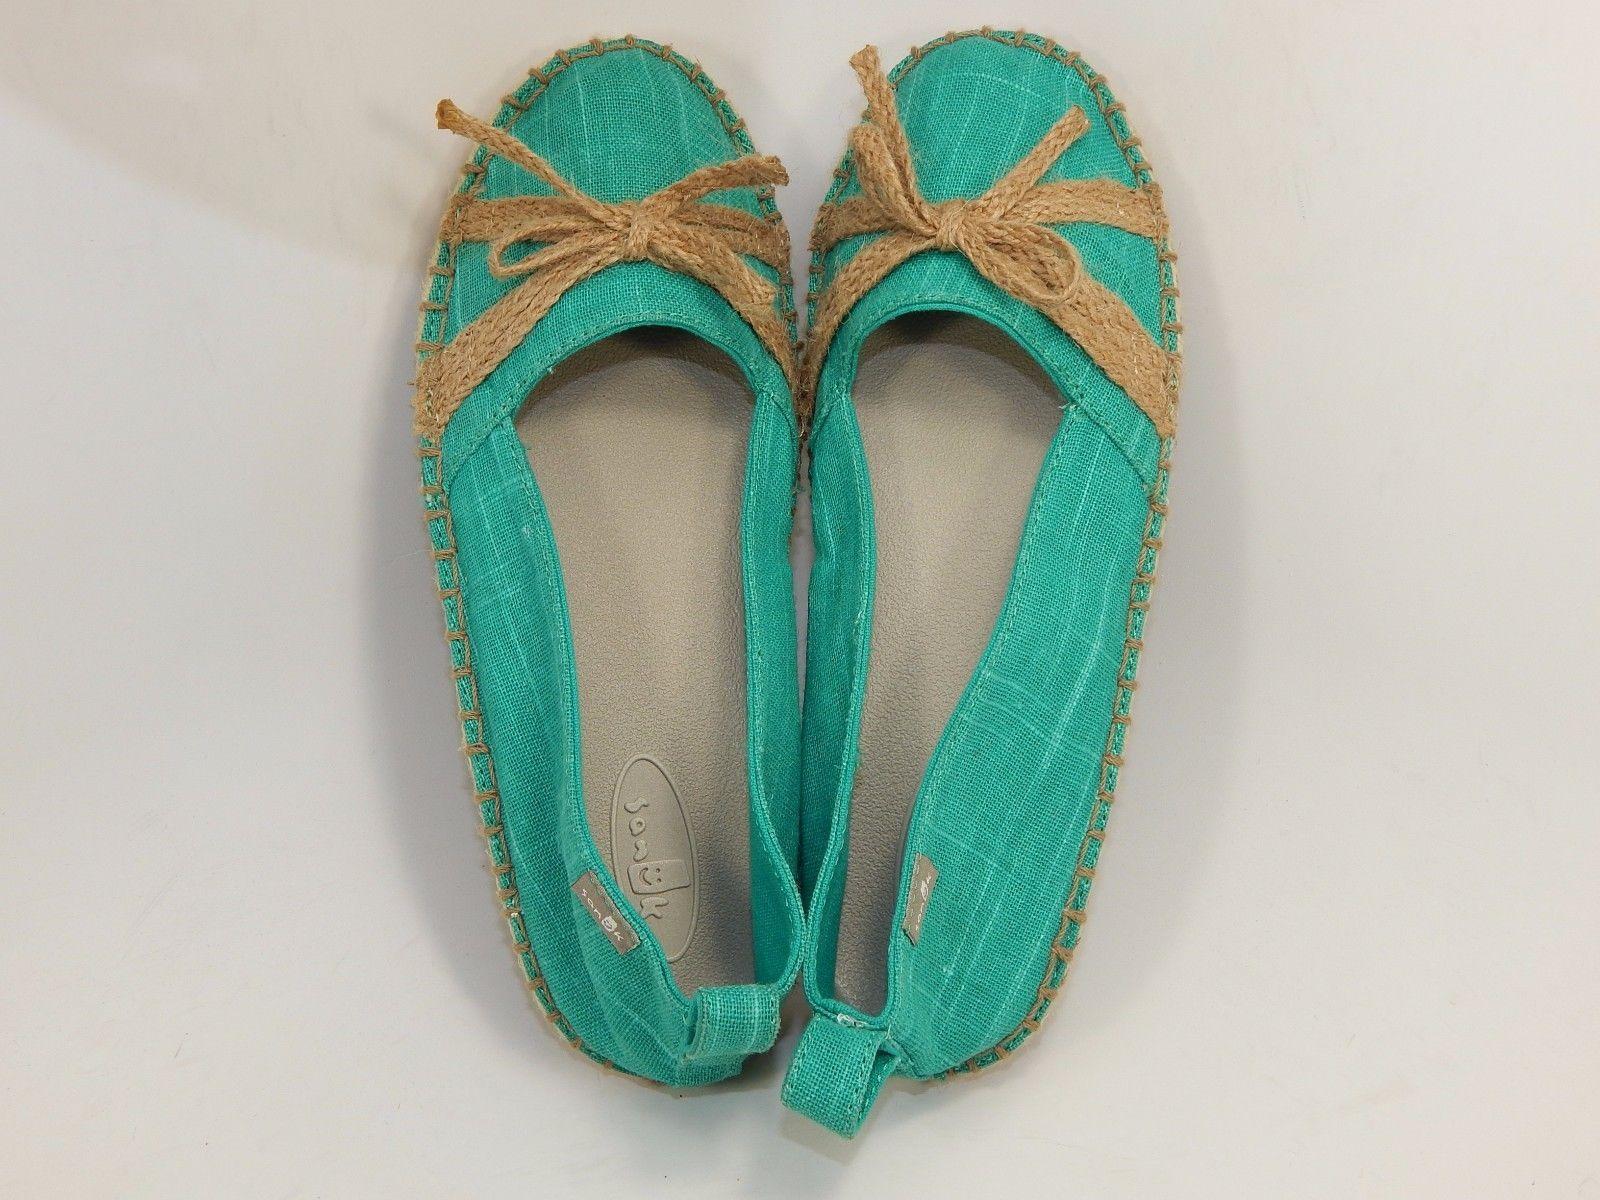 Sanuk Laci Turquois Colored Women's Casual Sandals Shoes Size US 7 M (B)